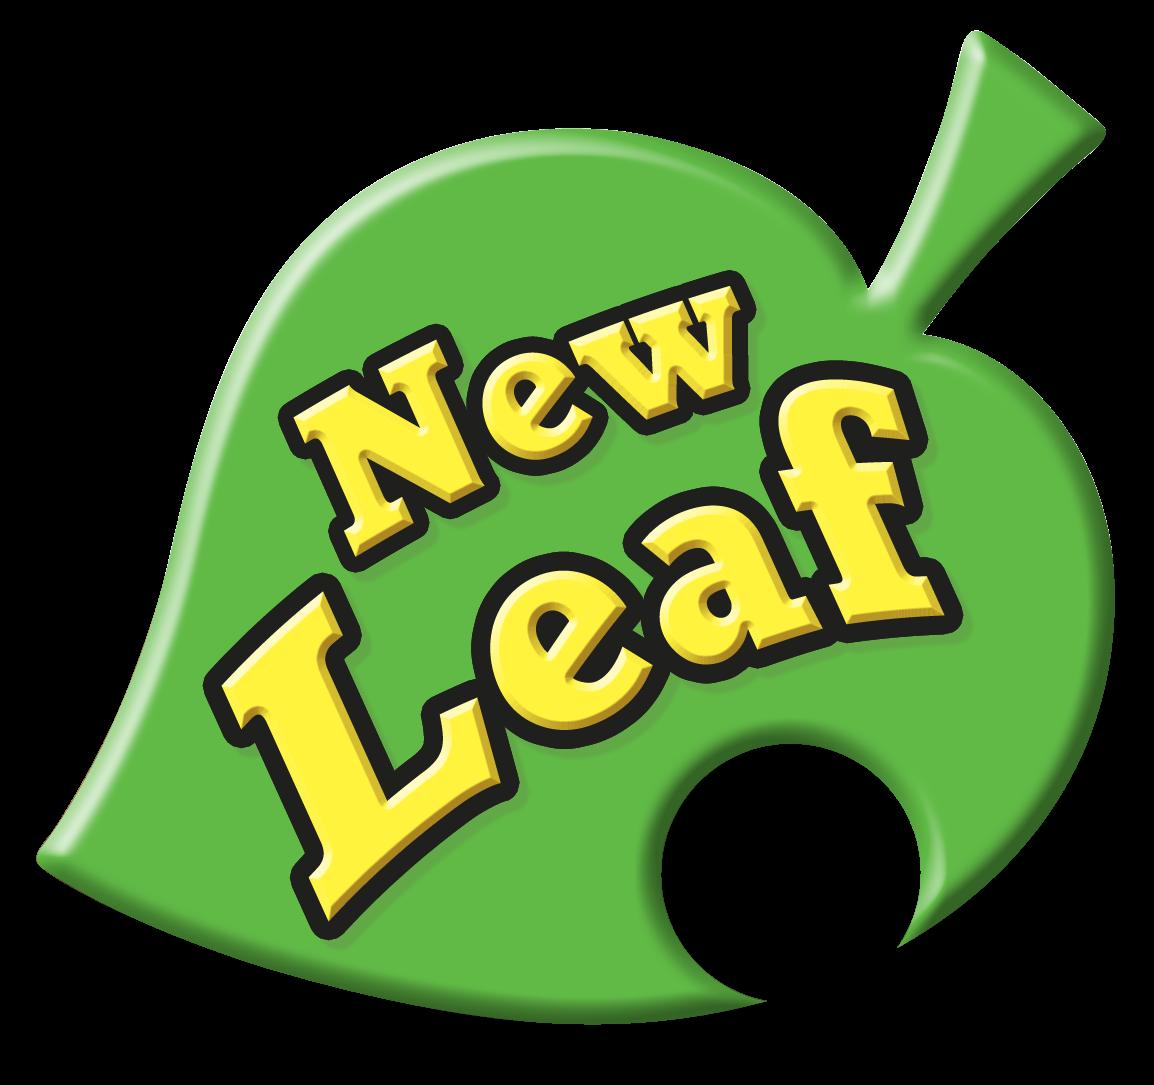 Animal crossing new leaf for Meuble japonais animal crossing new leaf